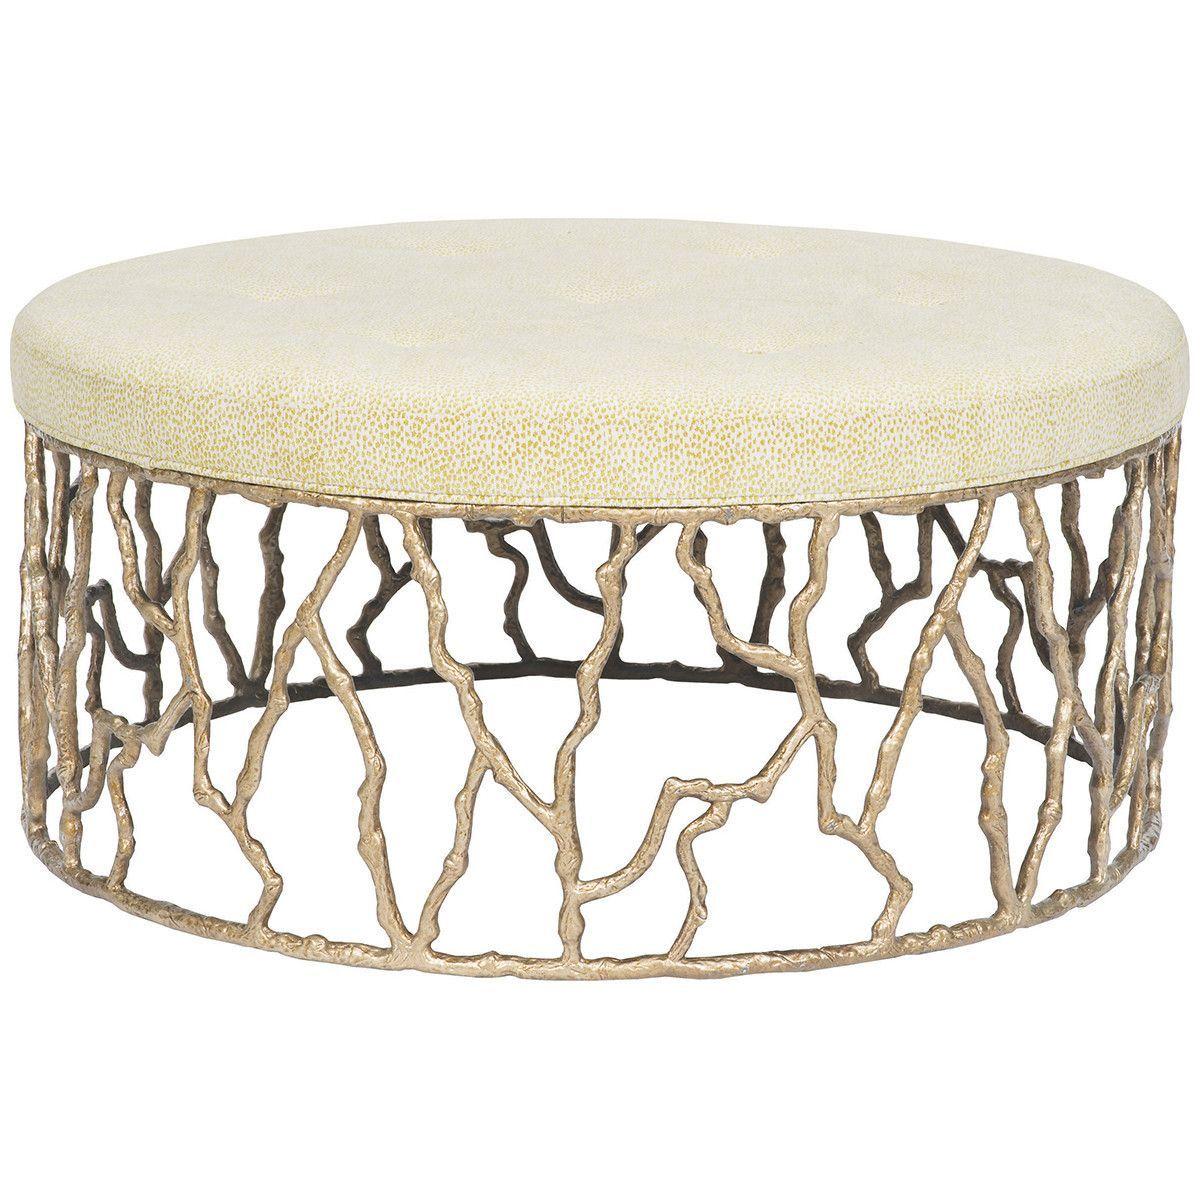 Super Vanguard Furniture Worthy Kiwi Gia Metal Base Button Ibusinesslaw Wood Chair Design Ideas Ibusinesslaworg